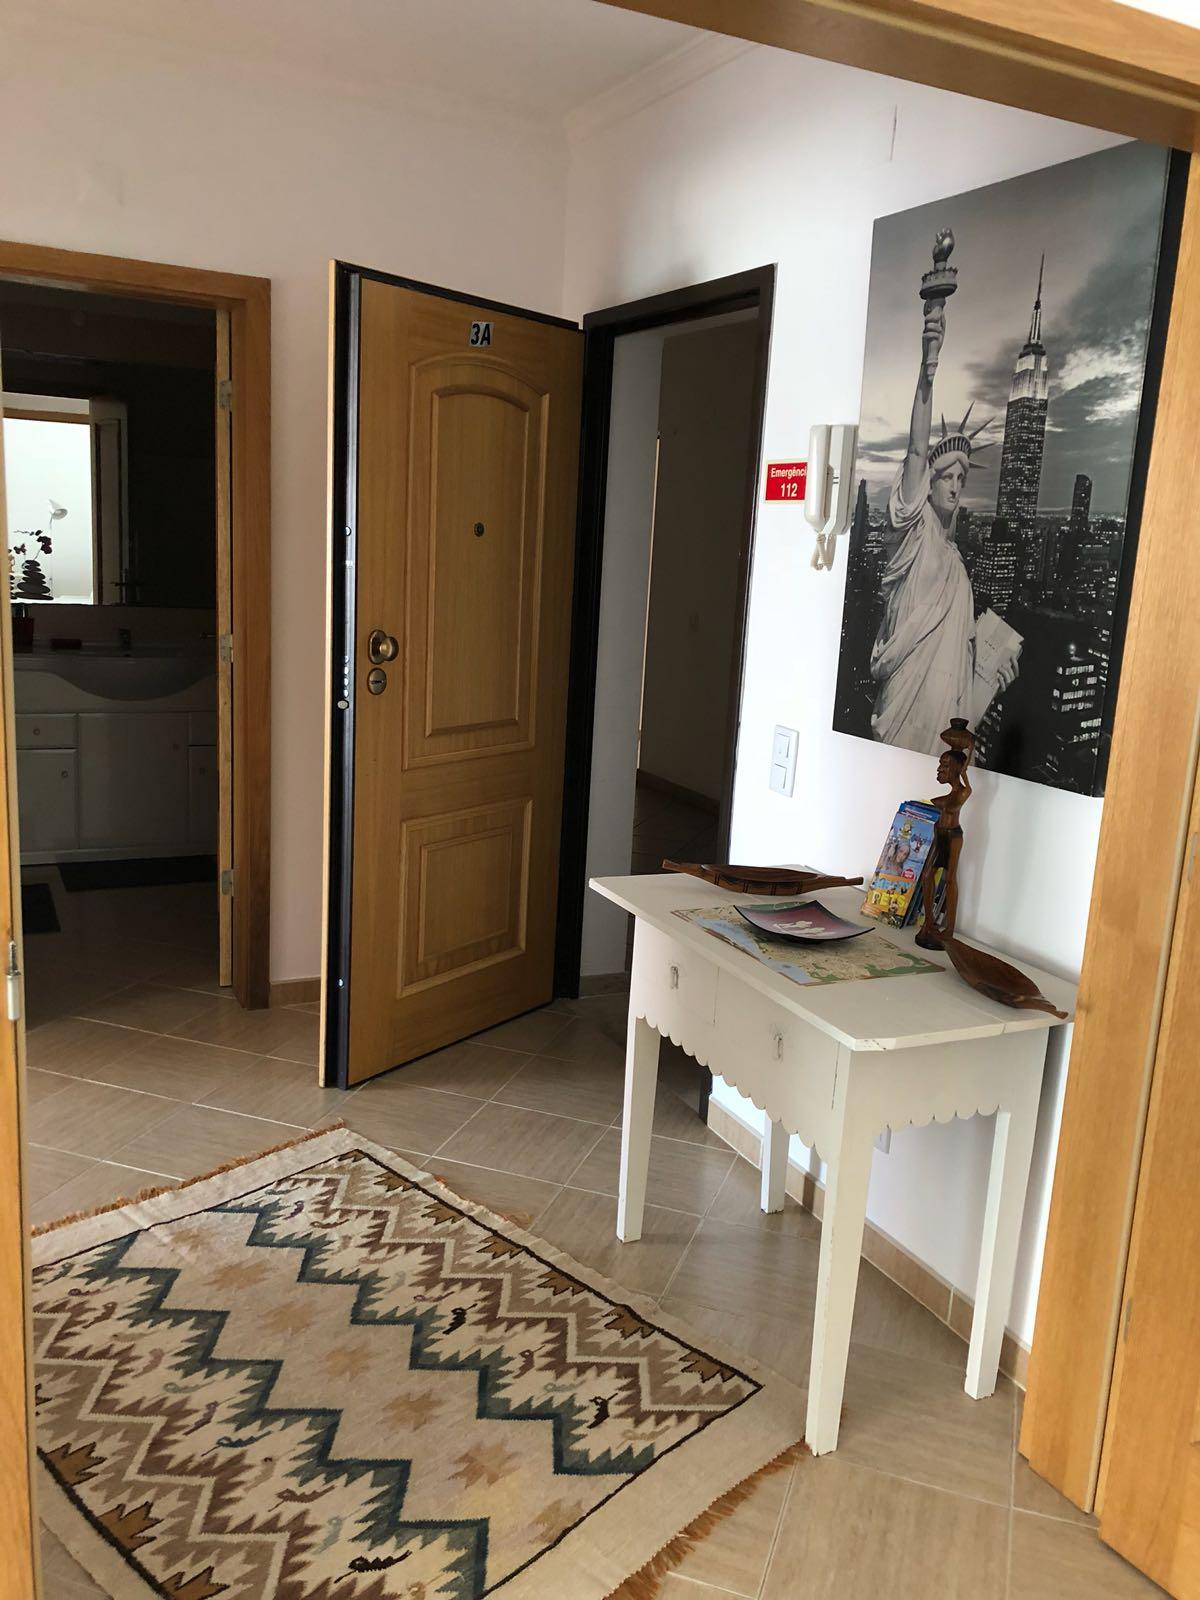 Holiday apartments and villas for rent, Apartamento T1 - Albufeira - Piscina e Garagem in Albufeira, Portugal Algarve, REF_IMG_6128_6130